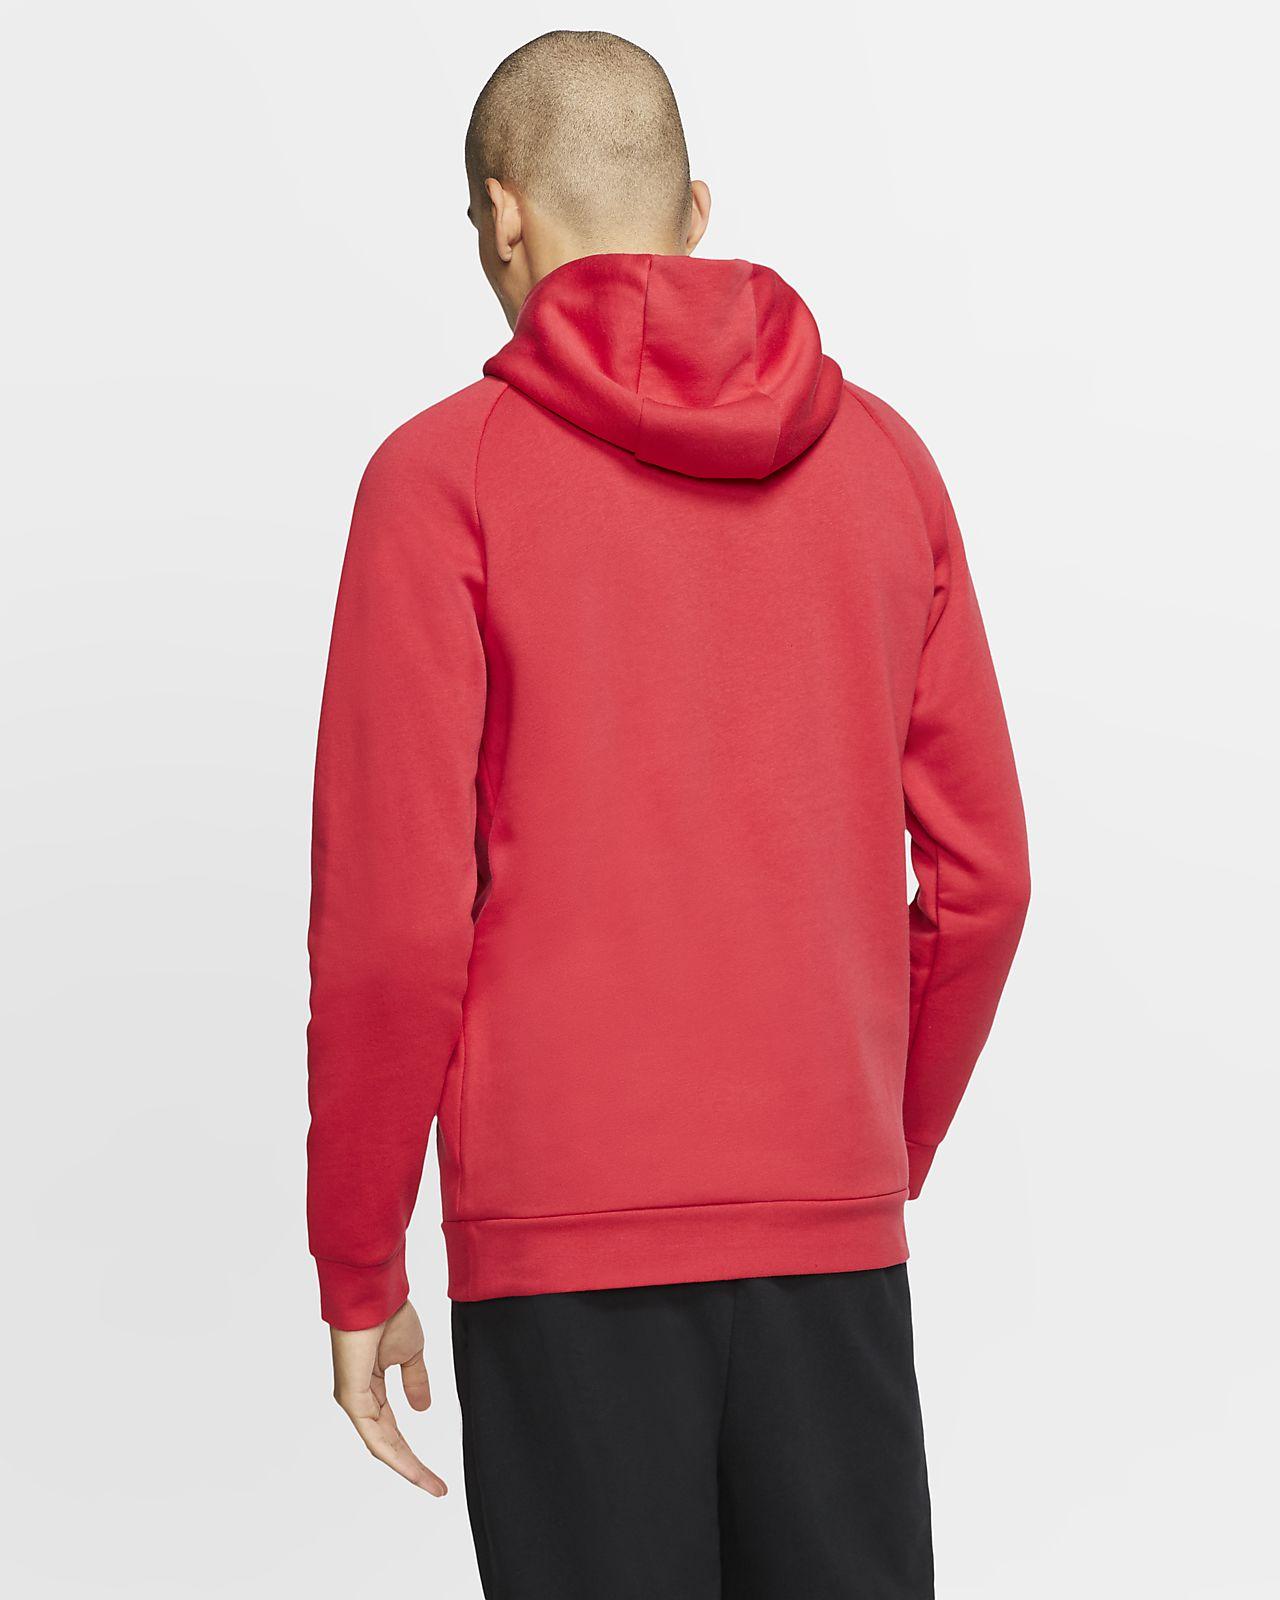 fa941b56 Jordan Jumpman Men's Fleece Pullover Hoodie. Nike.com